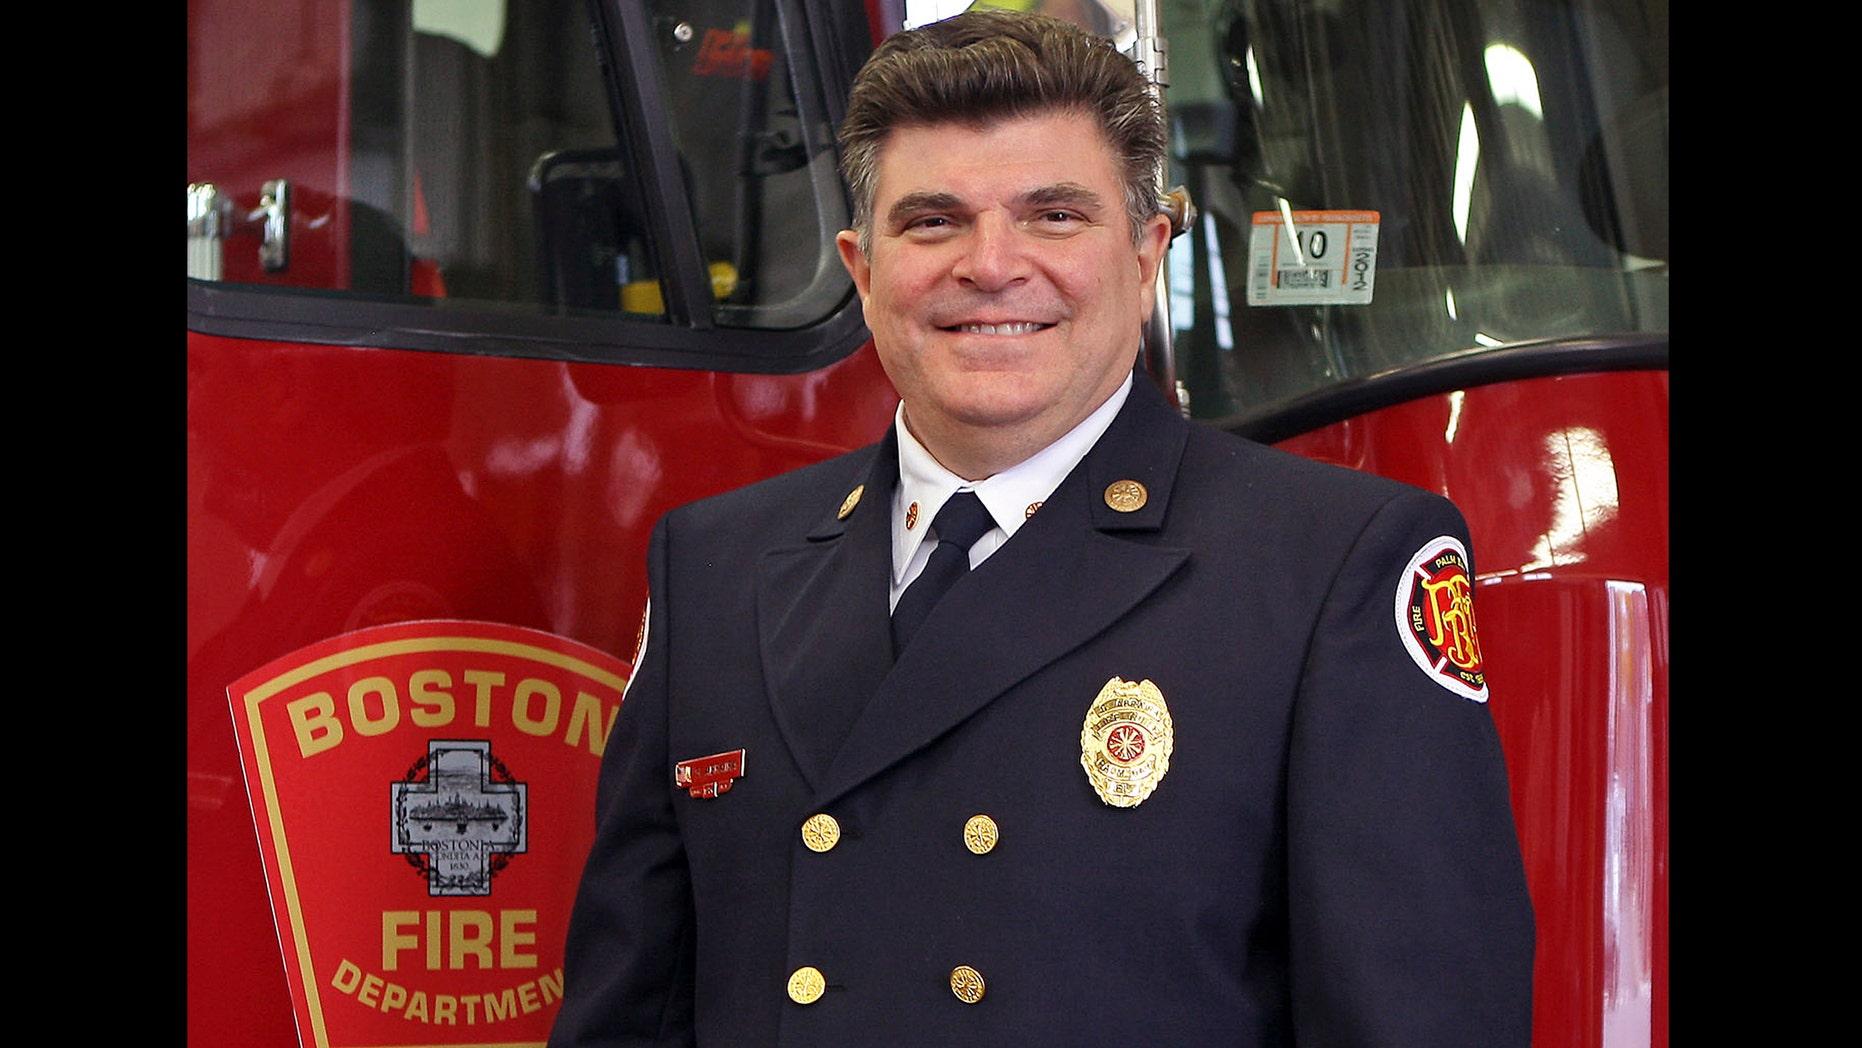 Boston Fire Chief Steve Abraira